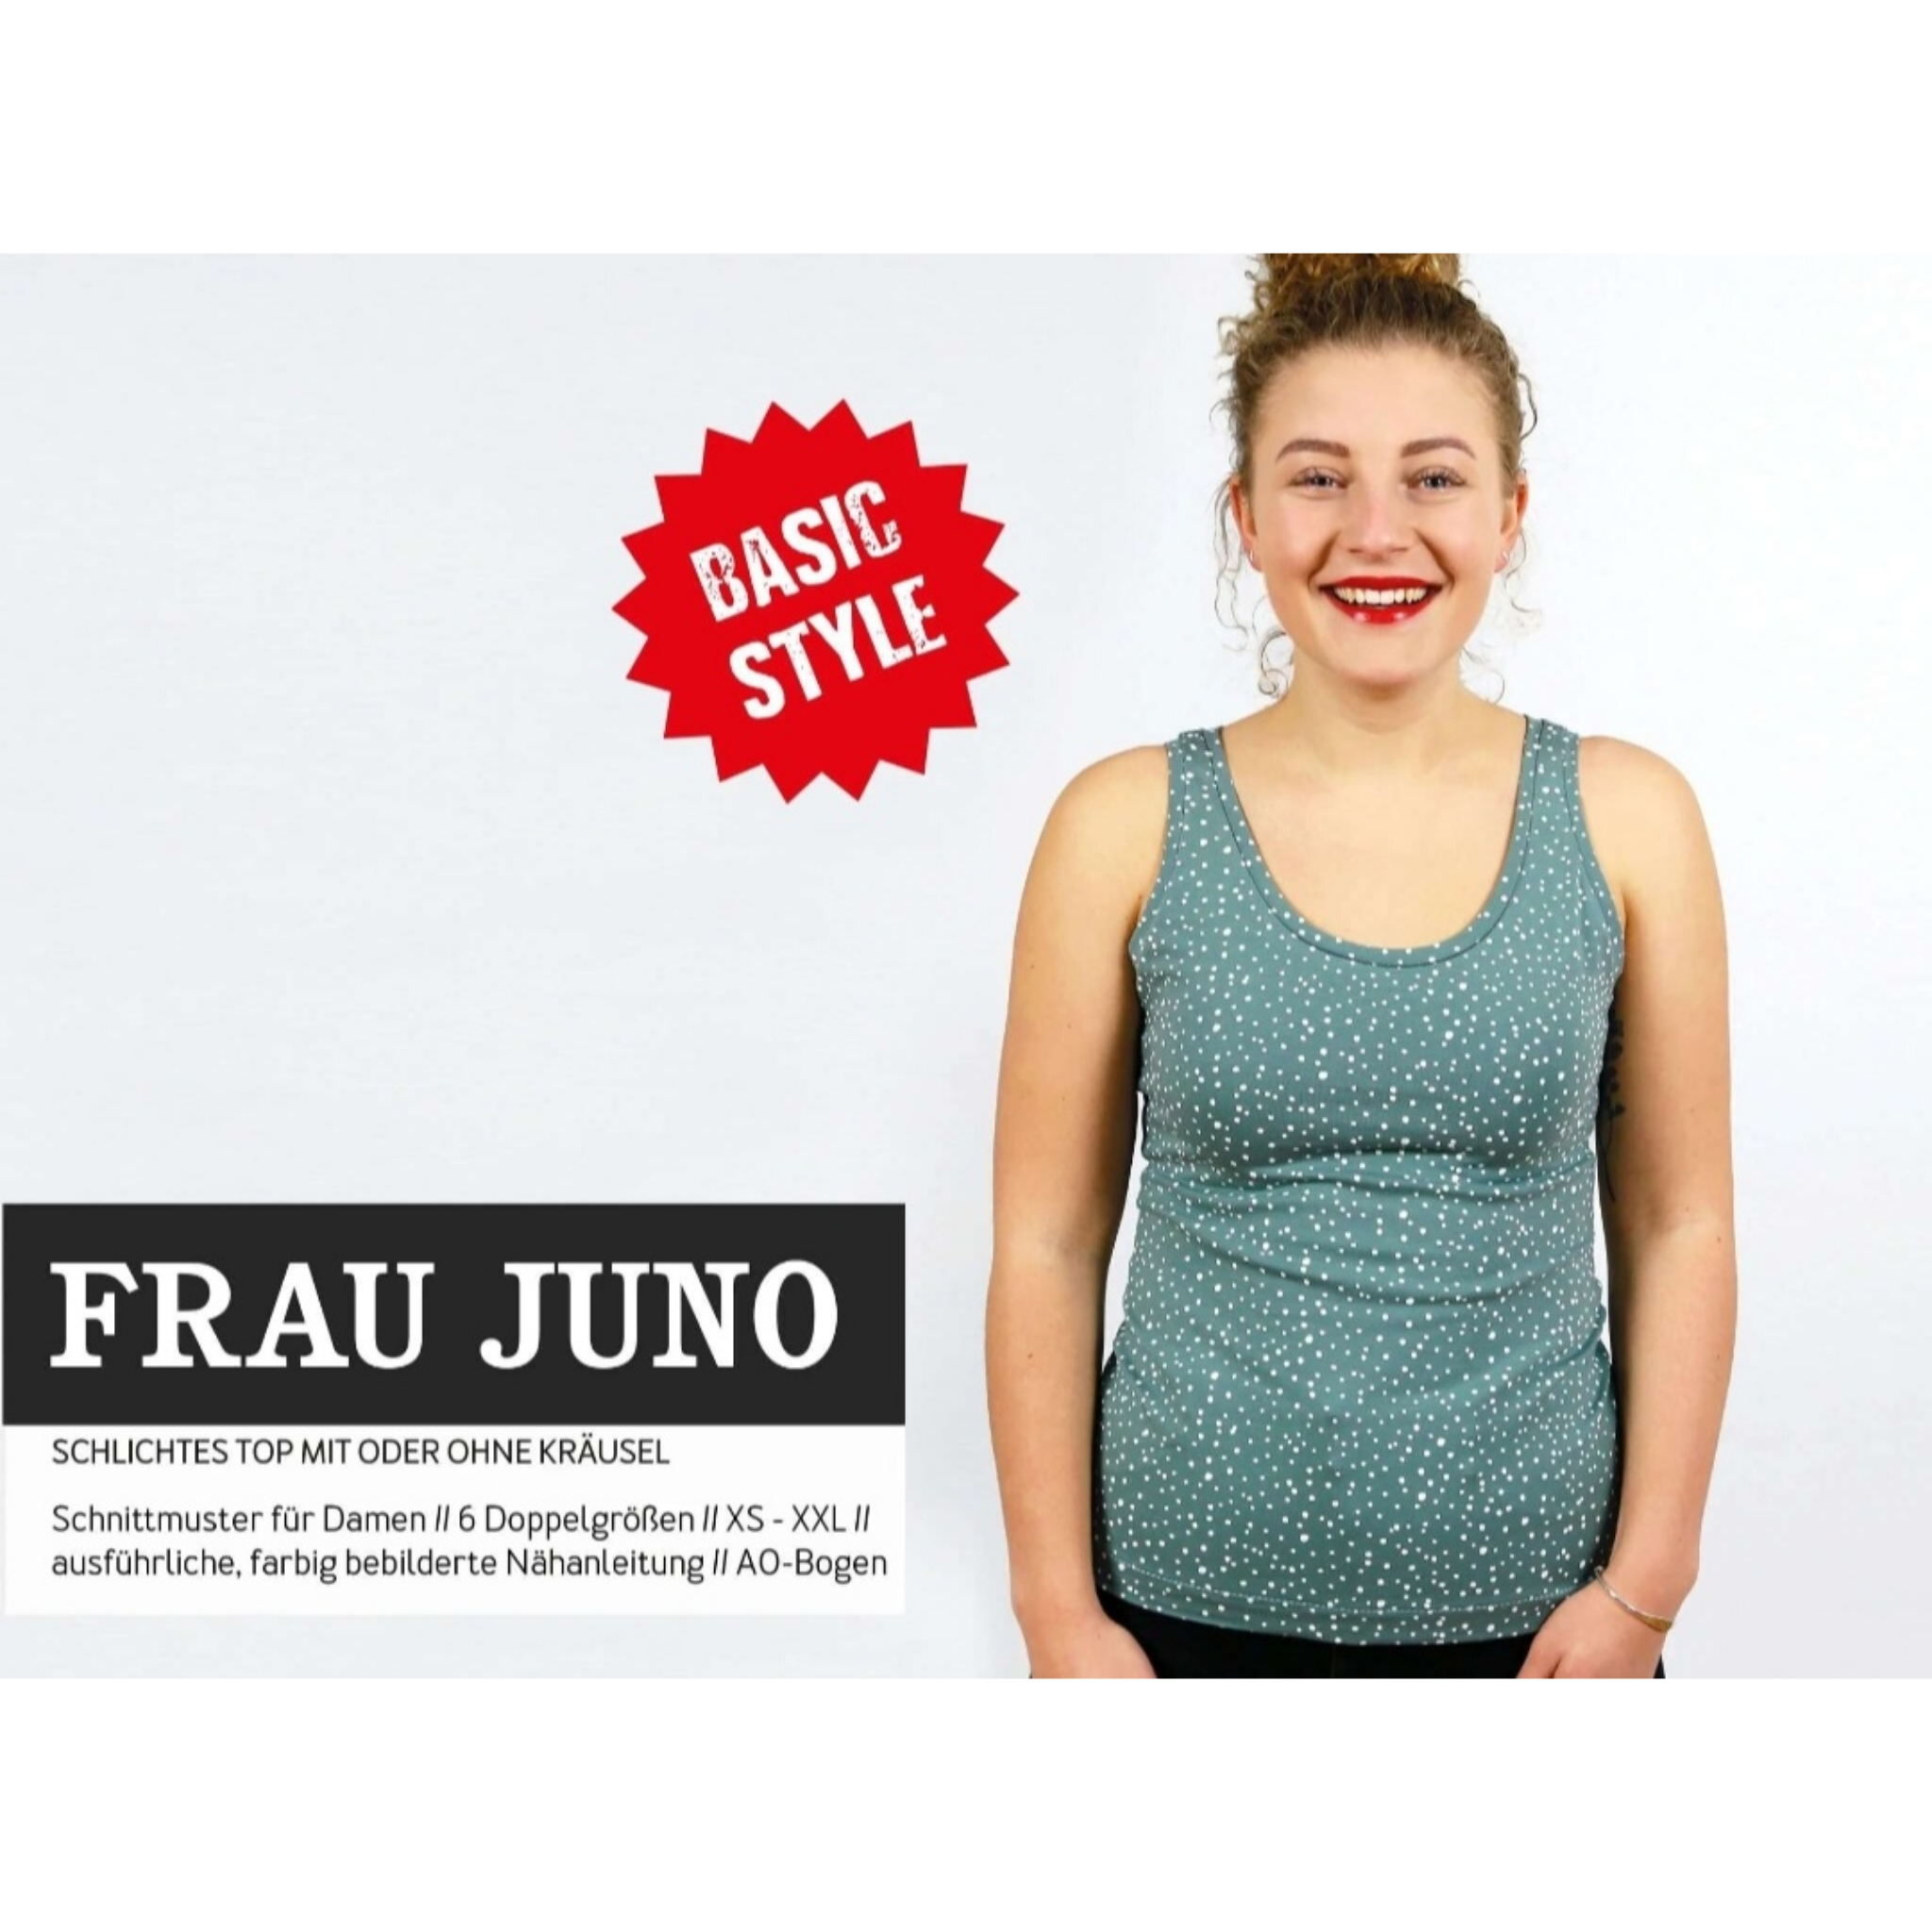 FRAU JUNO schnittmuster studio schnittreif